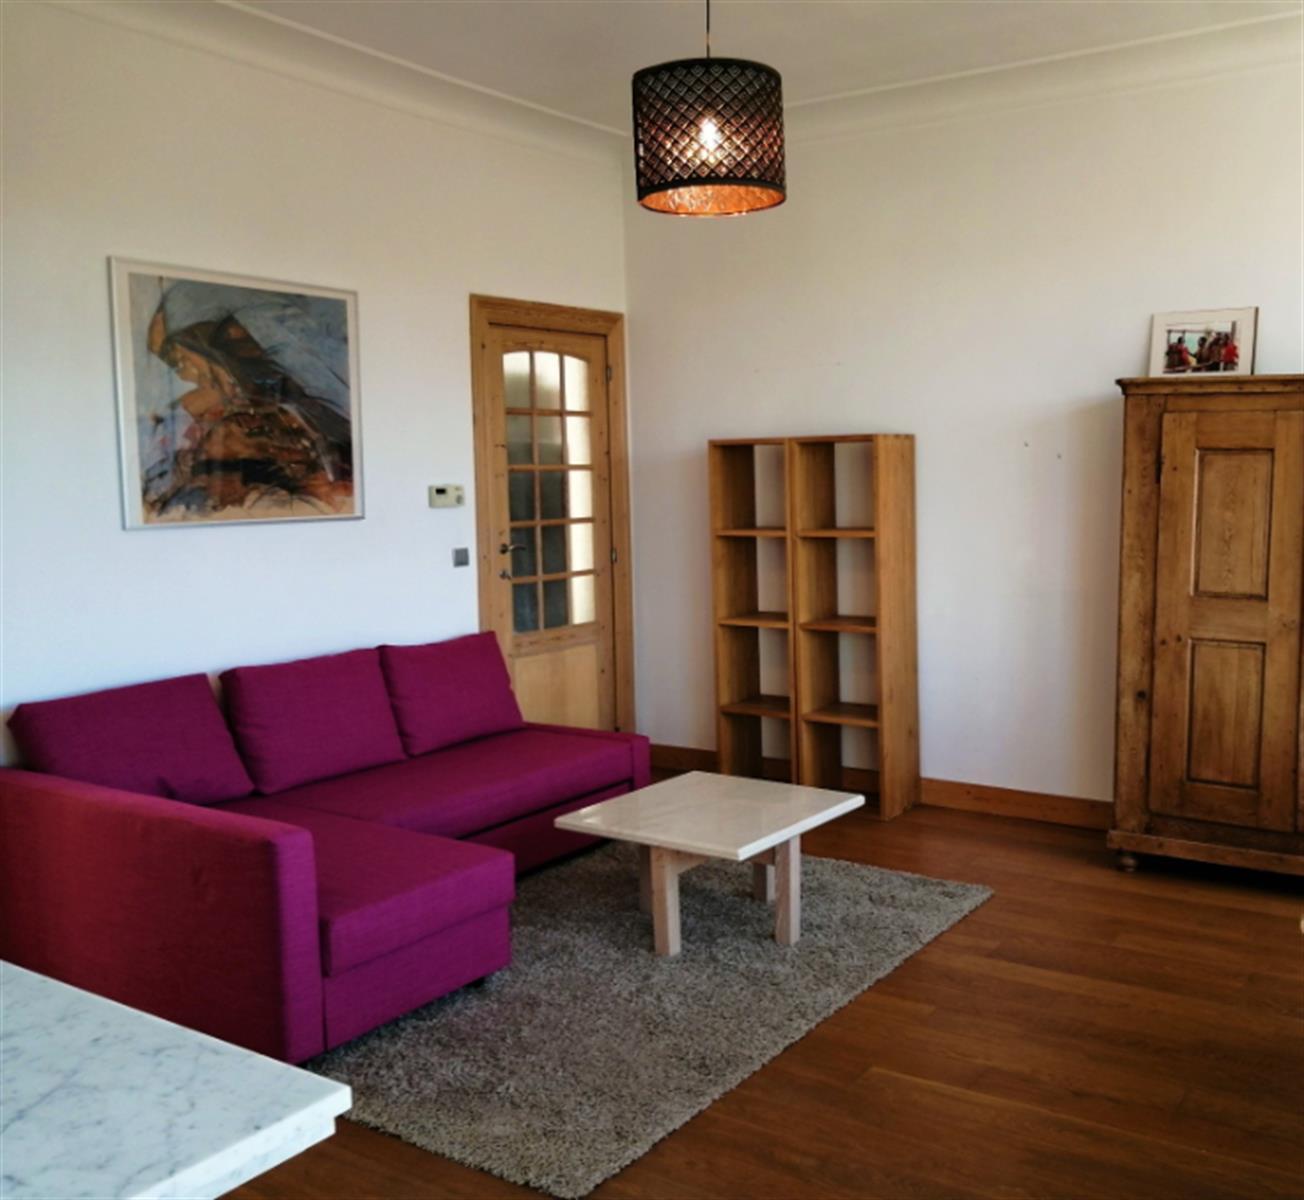 Appartement - Woluwe-Saint-Lambert - #4106440-0